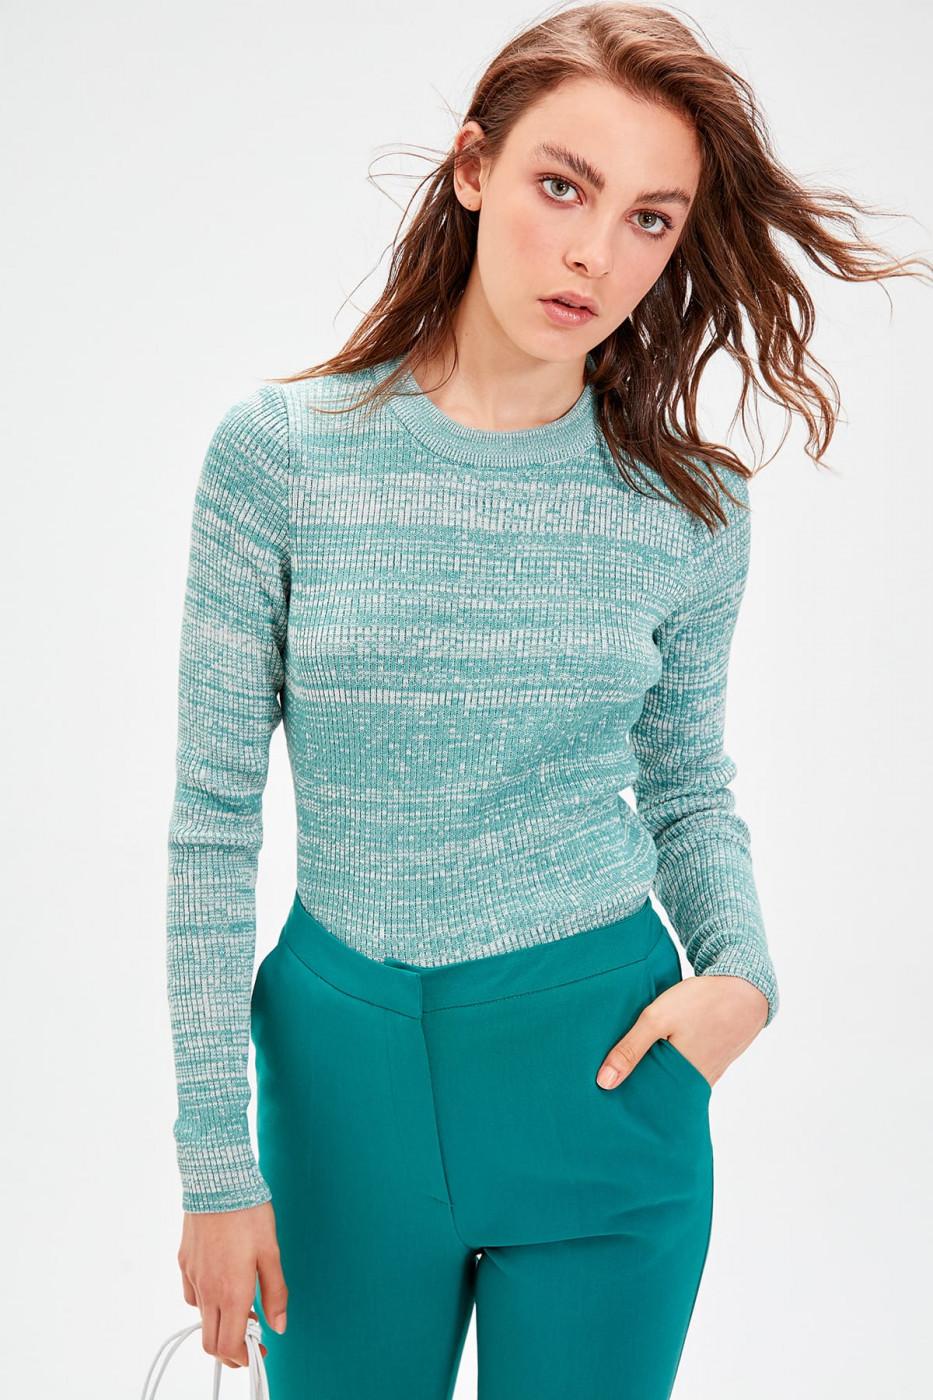 Trendyol Turquoise Multicolored Knitwear Sweater